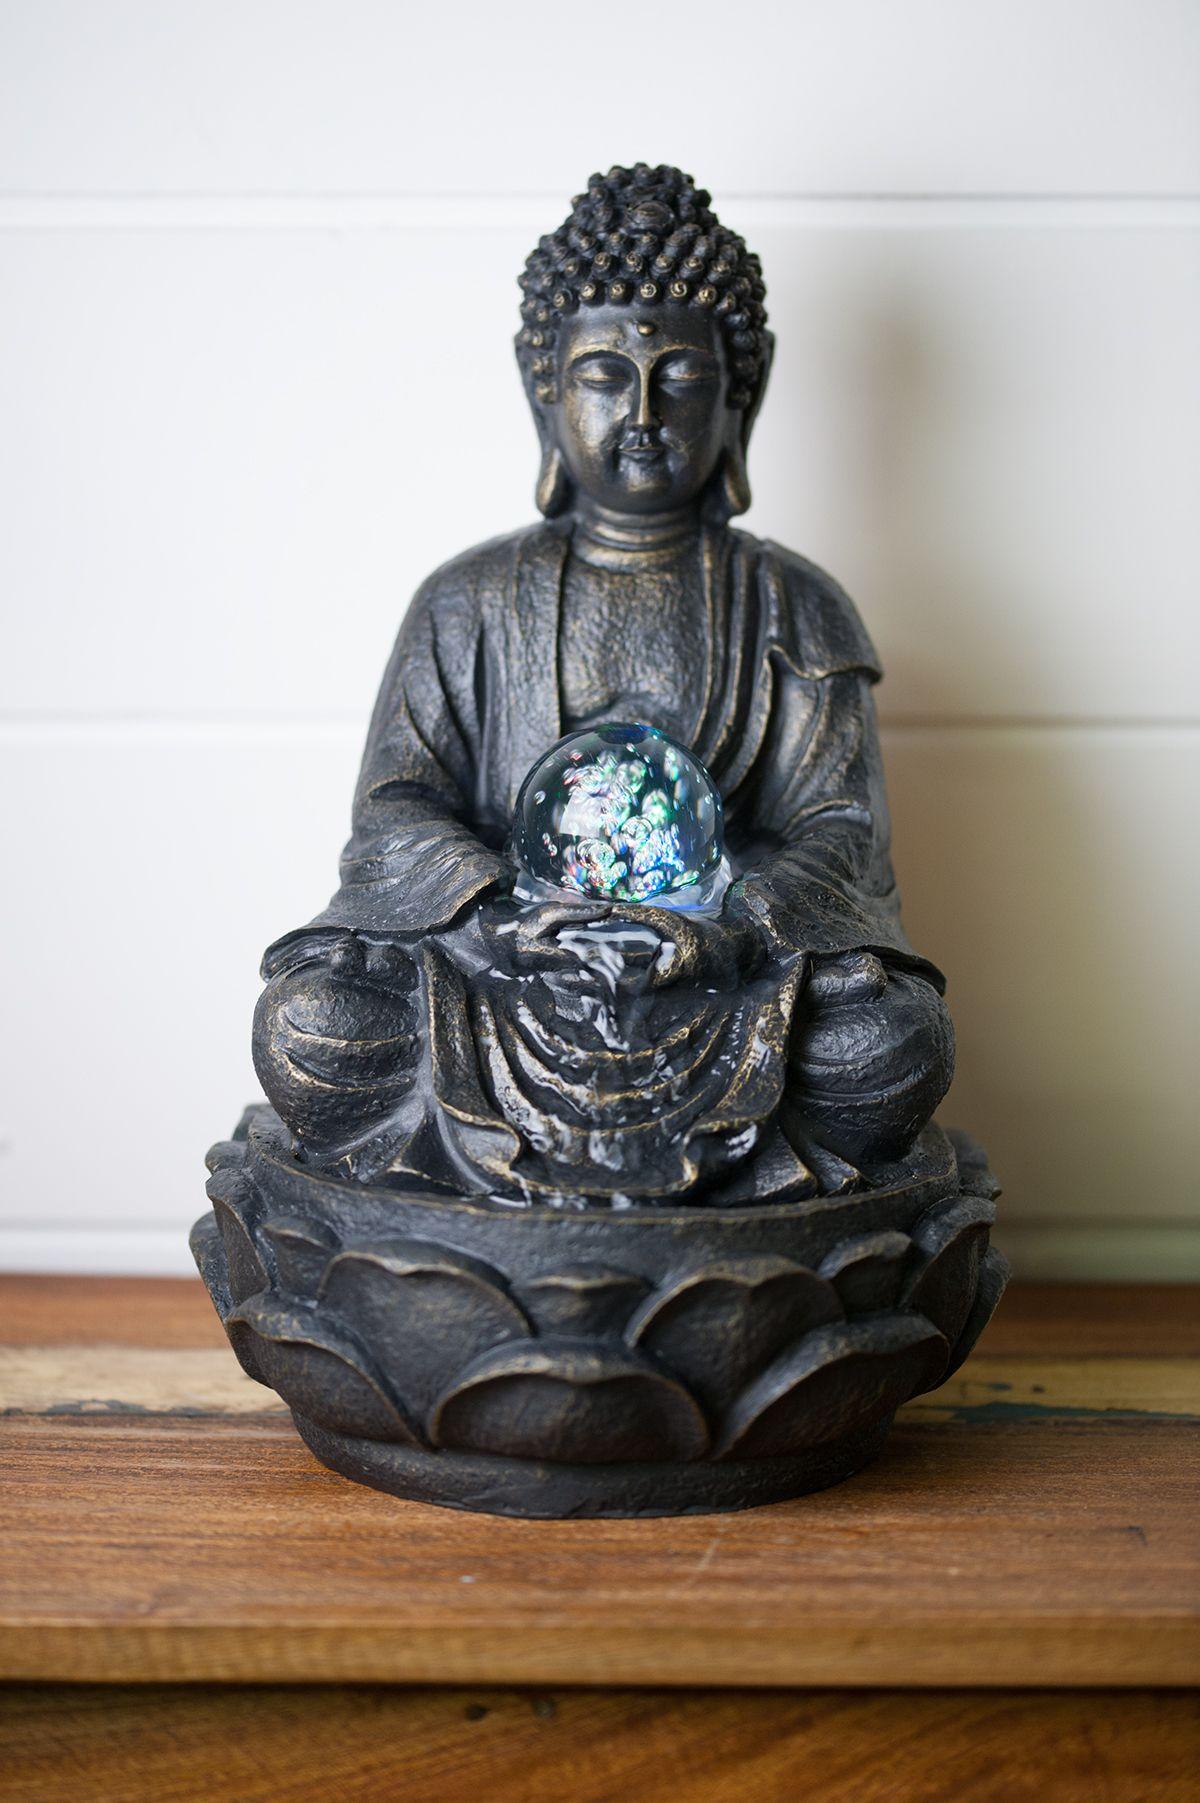 fontaine d corative fontaine d int rieur statue bouddha. Black Bedroom Furniture Sets. Home Design Ideas